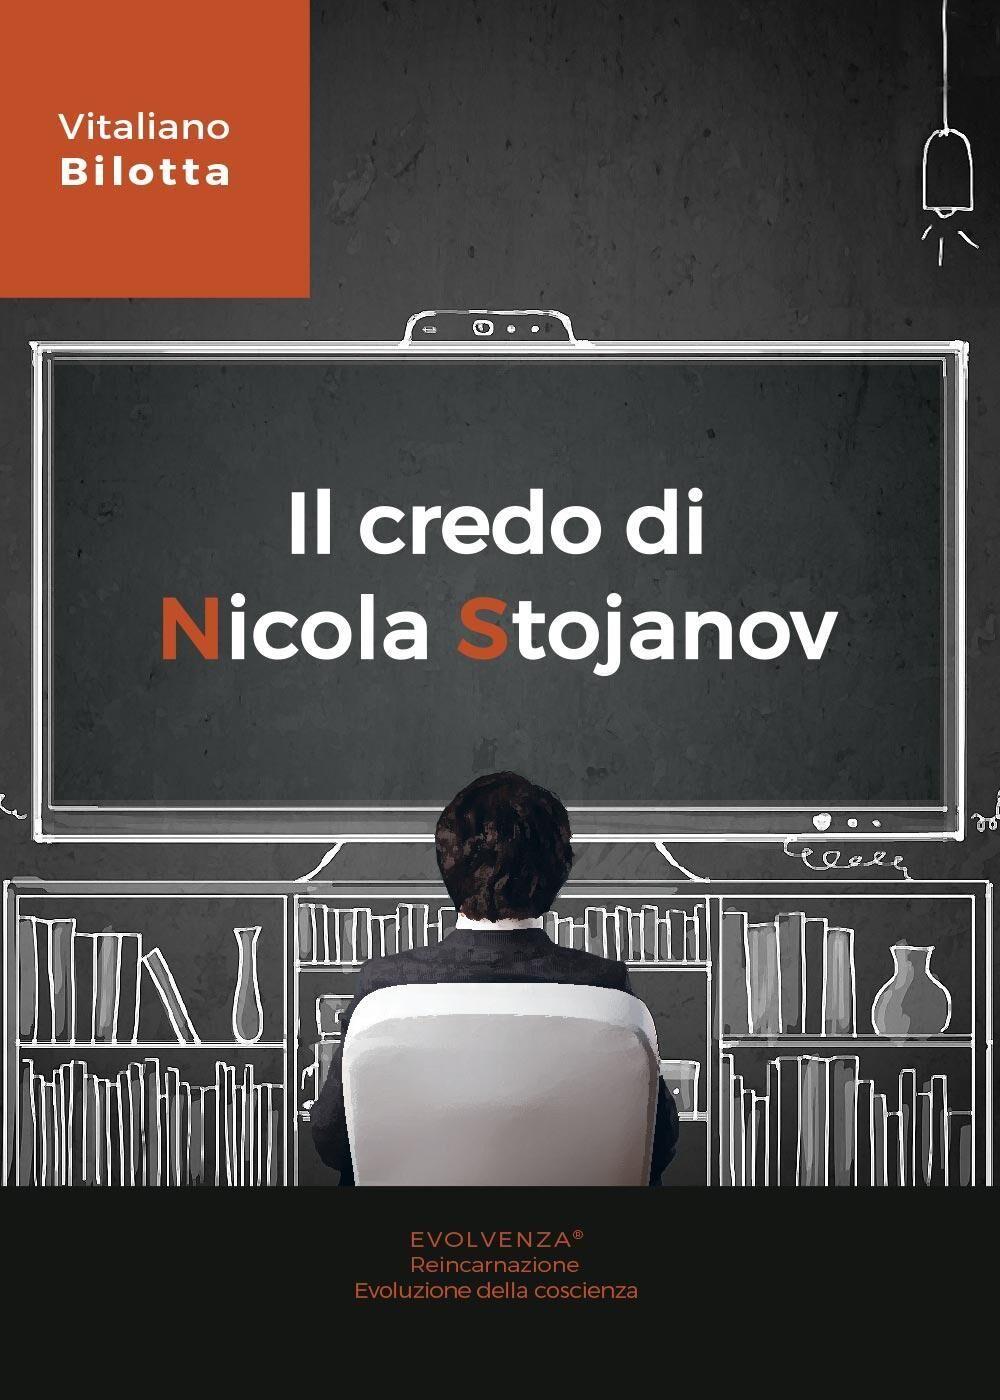 Il credo di Nicola Stojanov